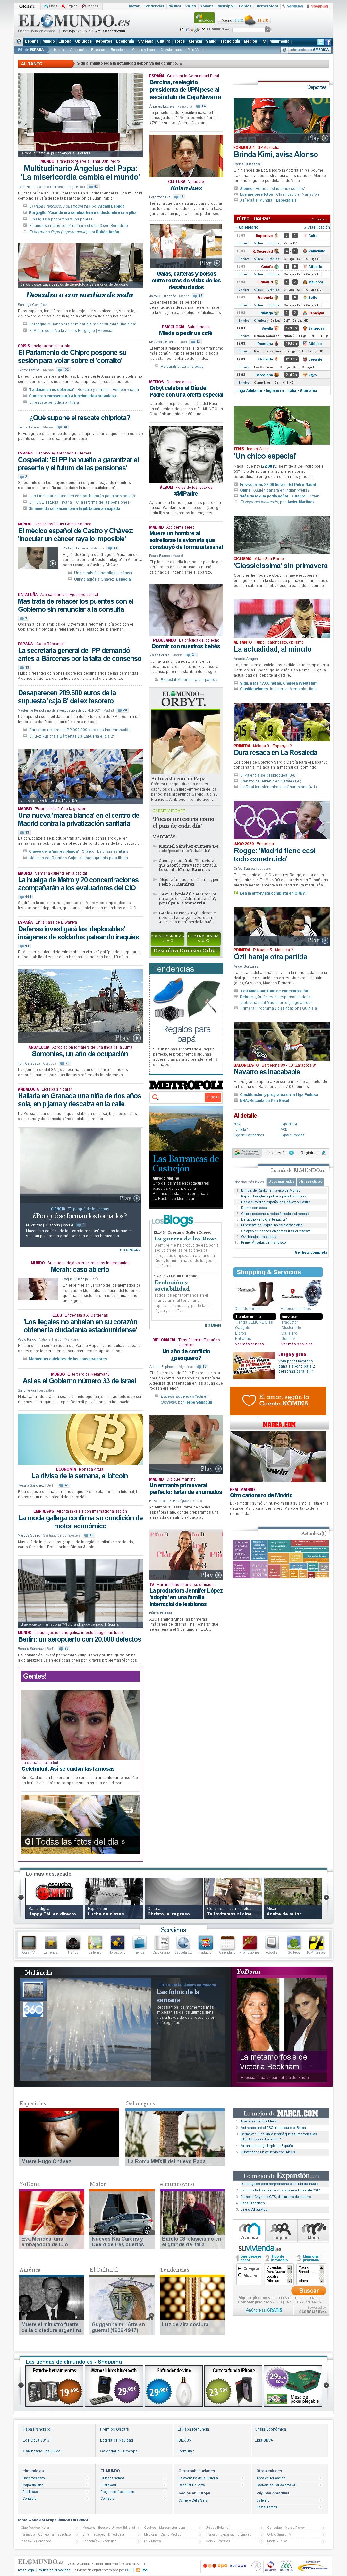 El Mundo at Sunday March 17, 2013, 2:18 p.m. UTC